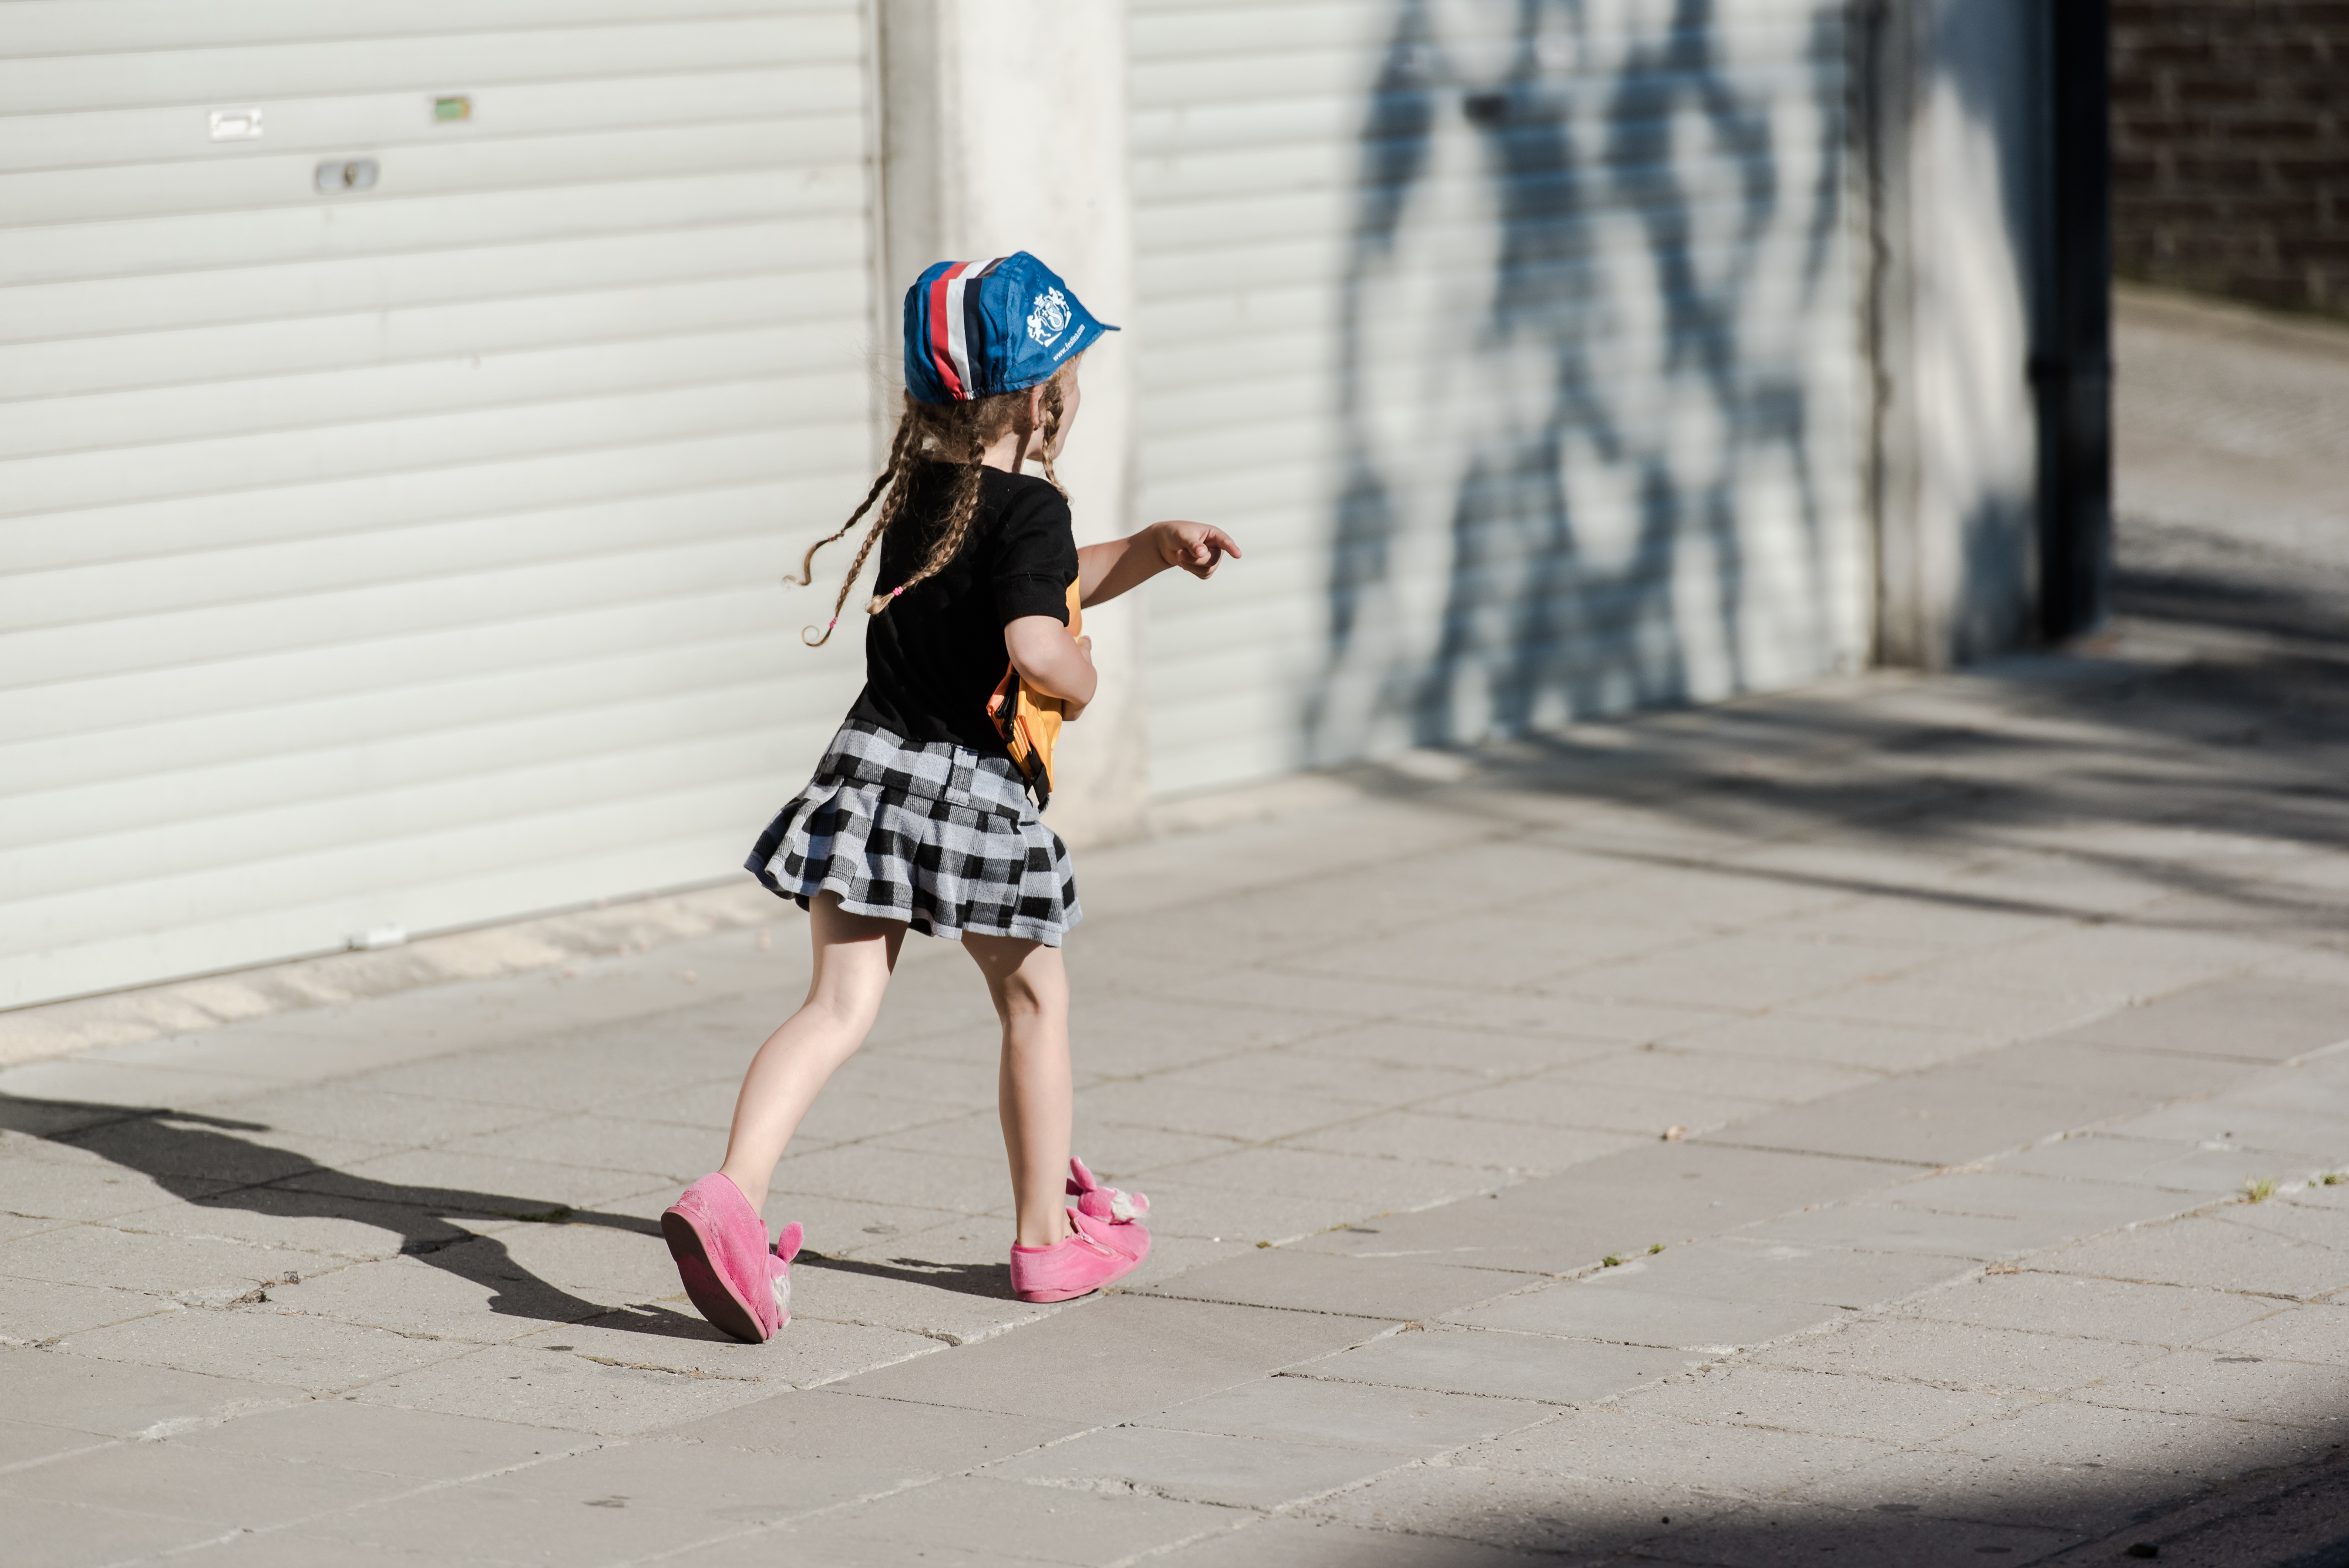 Home – 3 – lopend kind